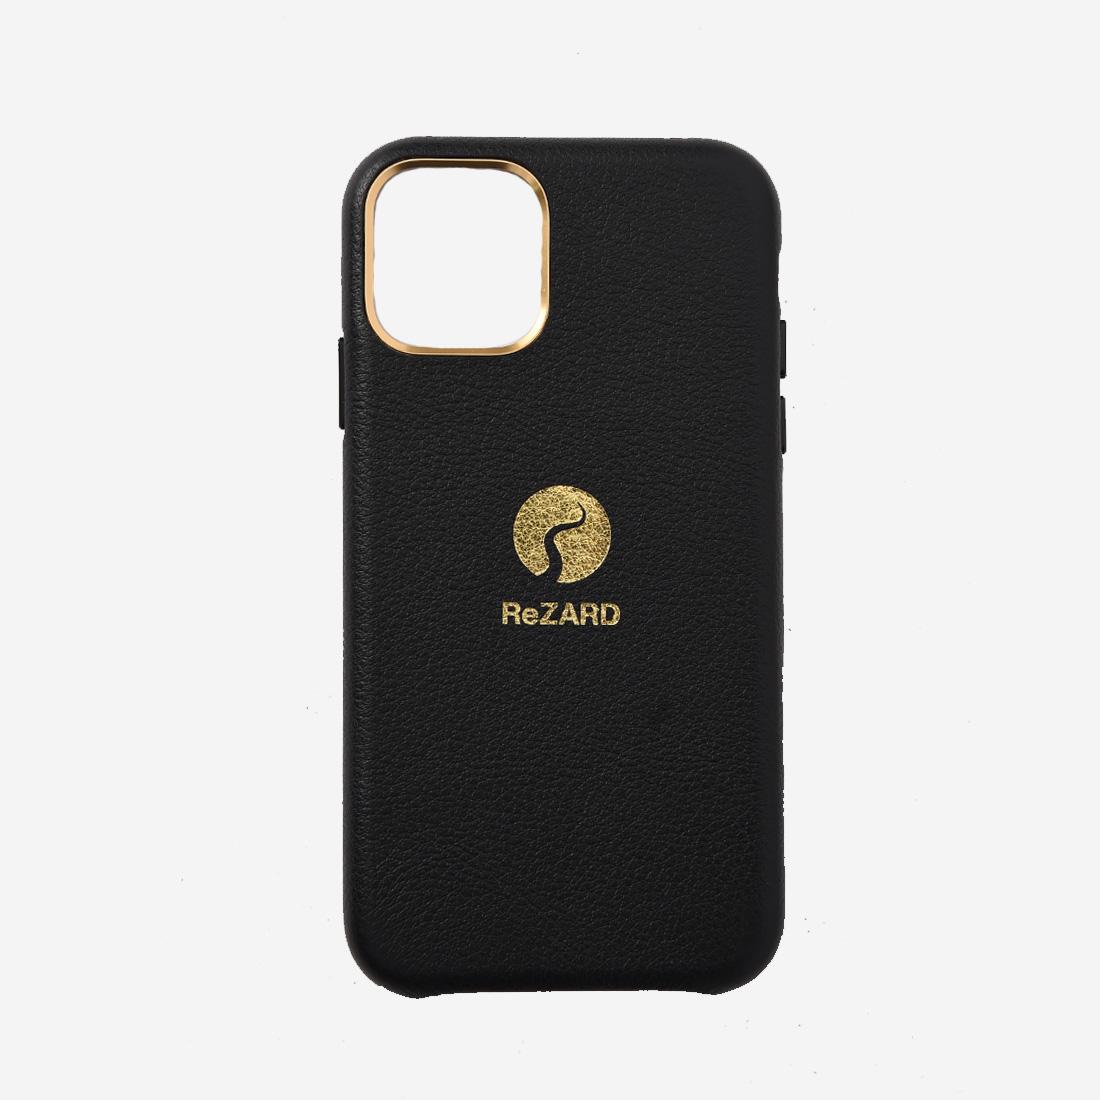 【ReZARD】Logo Leather iPhone case